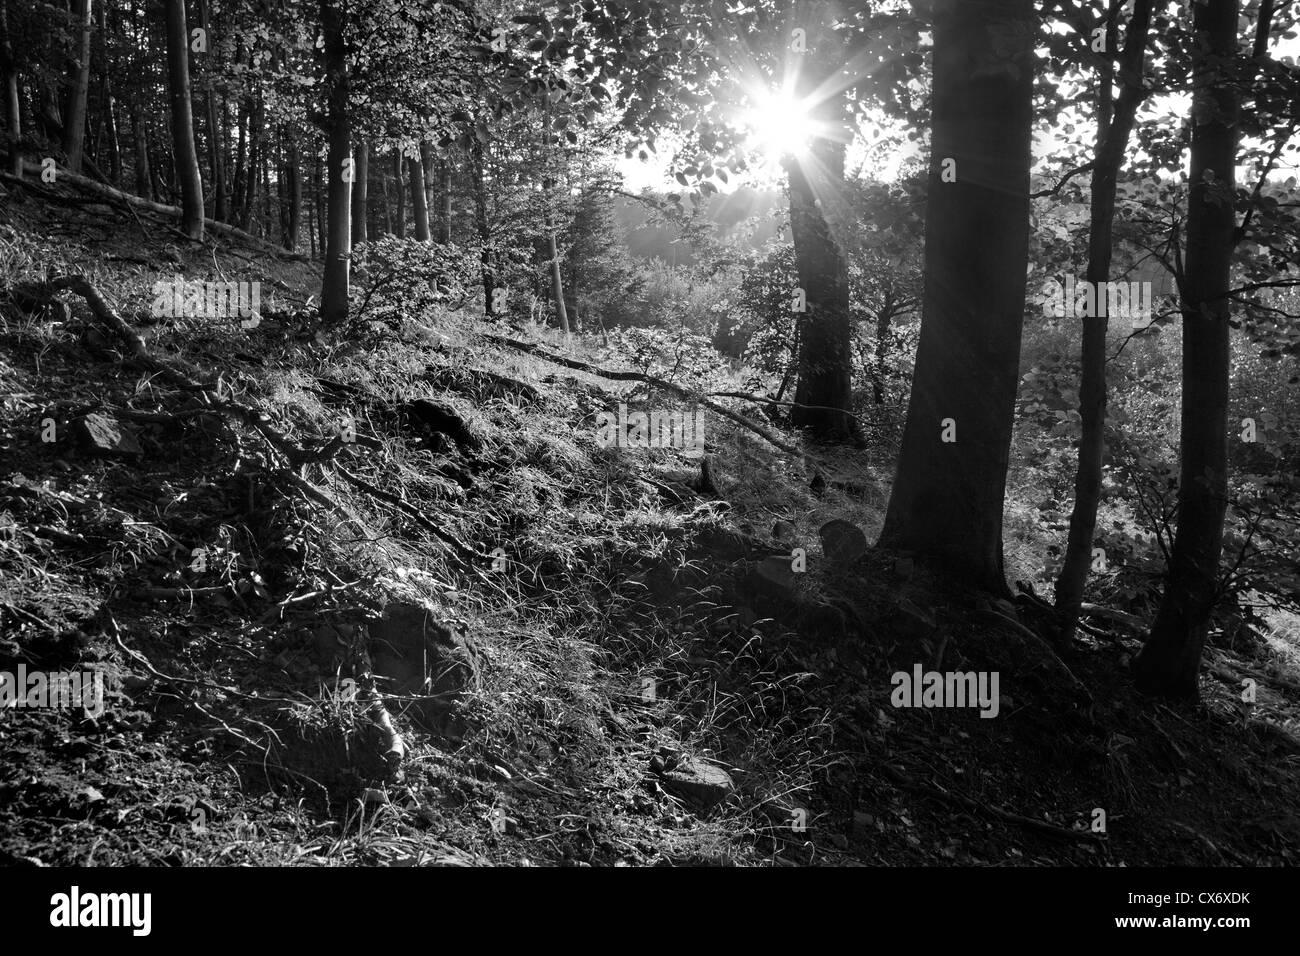 Hintergrundbeleuchtung in Holz Stockbild